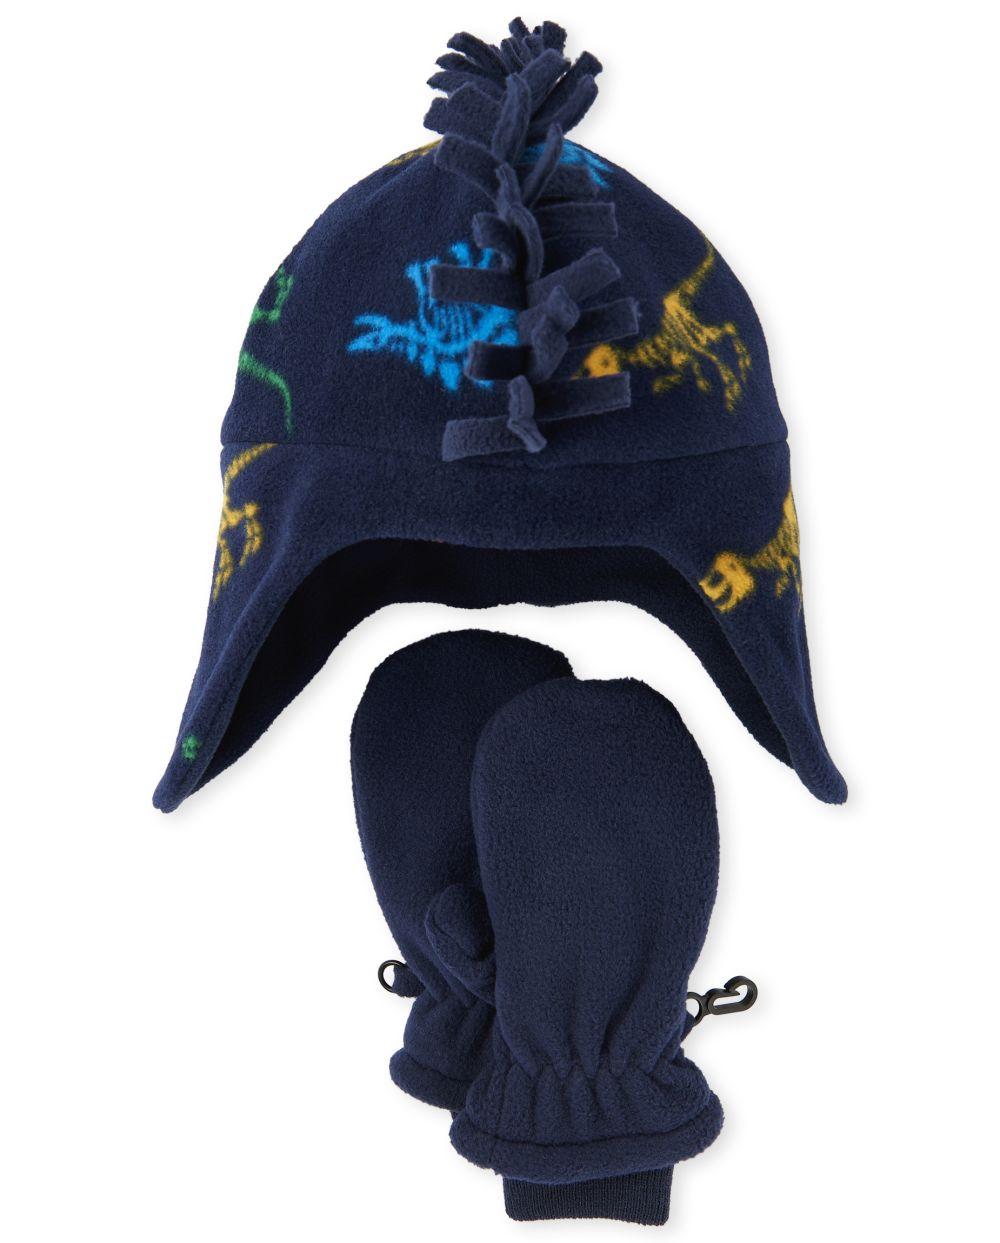 Toddler Boys Dino Glacier Fleece Hat And Mittens Set - Blue